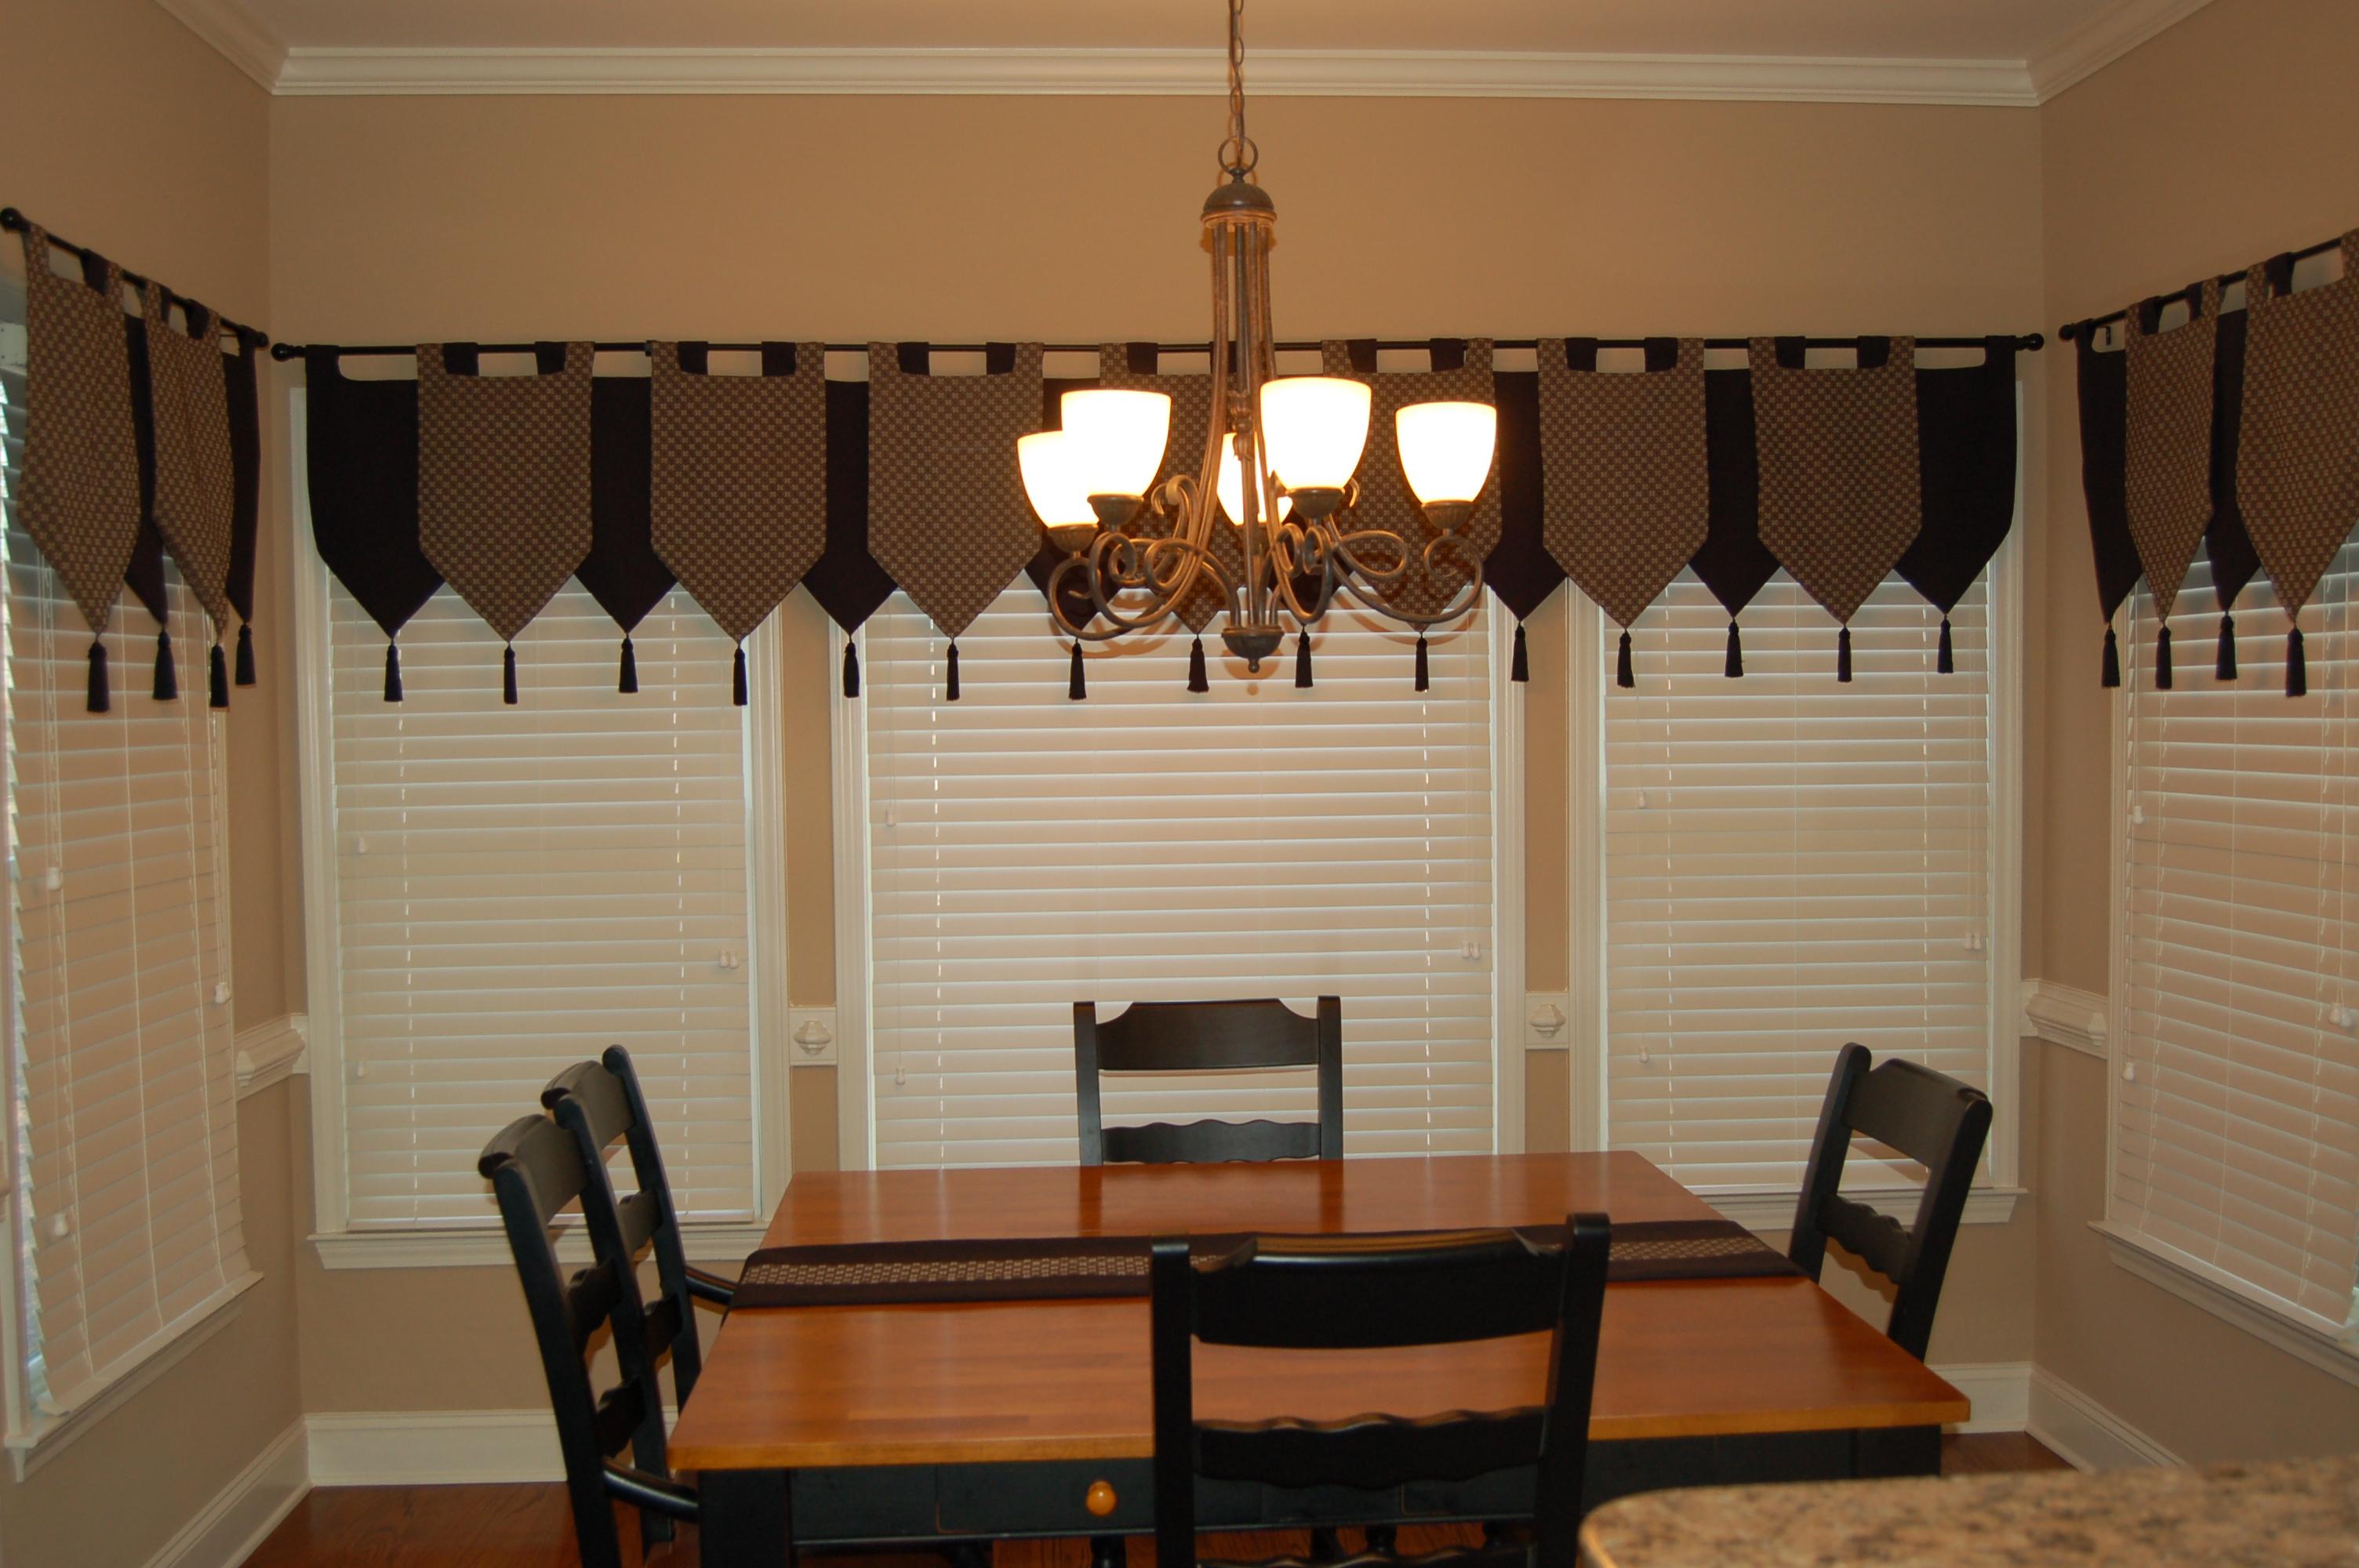 Kitchen Curtains Patterns Catalog Of Patterns